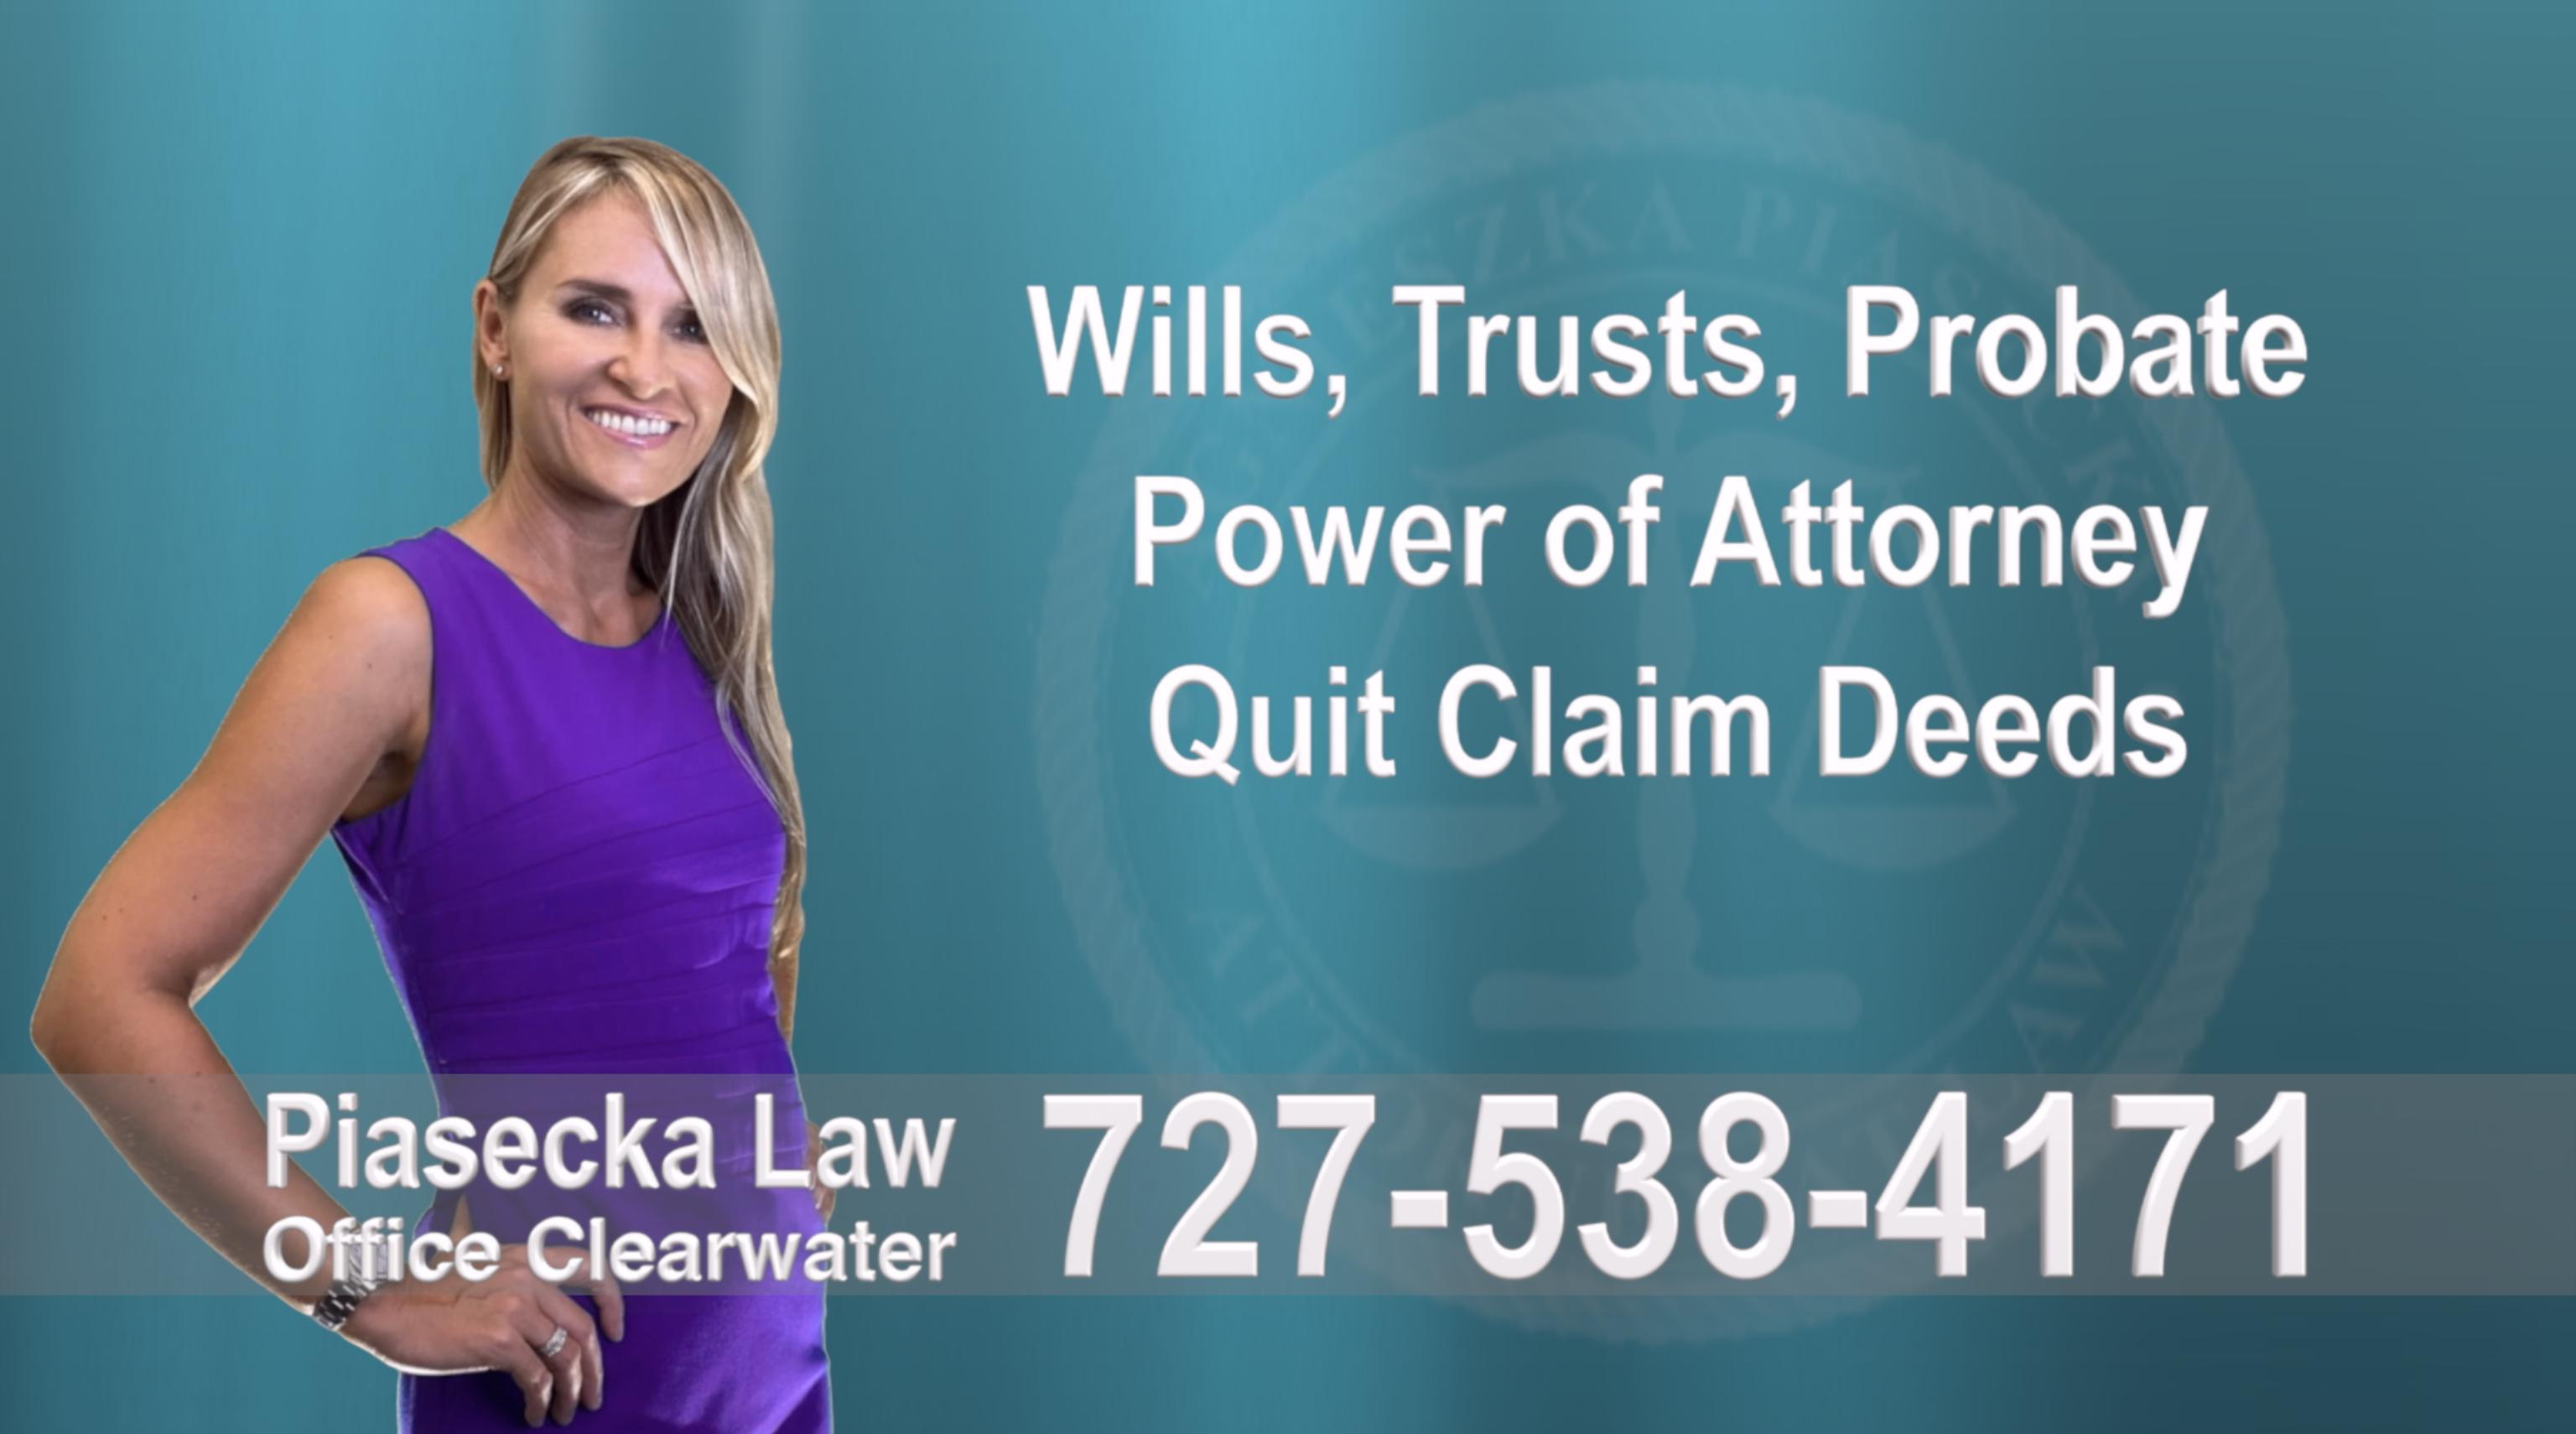 Wills, Trusts, Power of Attorney, Will, Testament, Trust, POA, Deed, Deeds, Quitclaim, Quit Claim, Attorney, Lawyer, Prawnik, Adwokat, Polski, Polish, Agnieszka, Aga, Piasecka